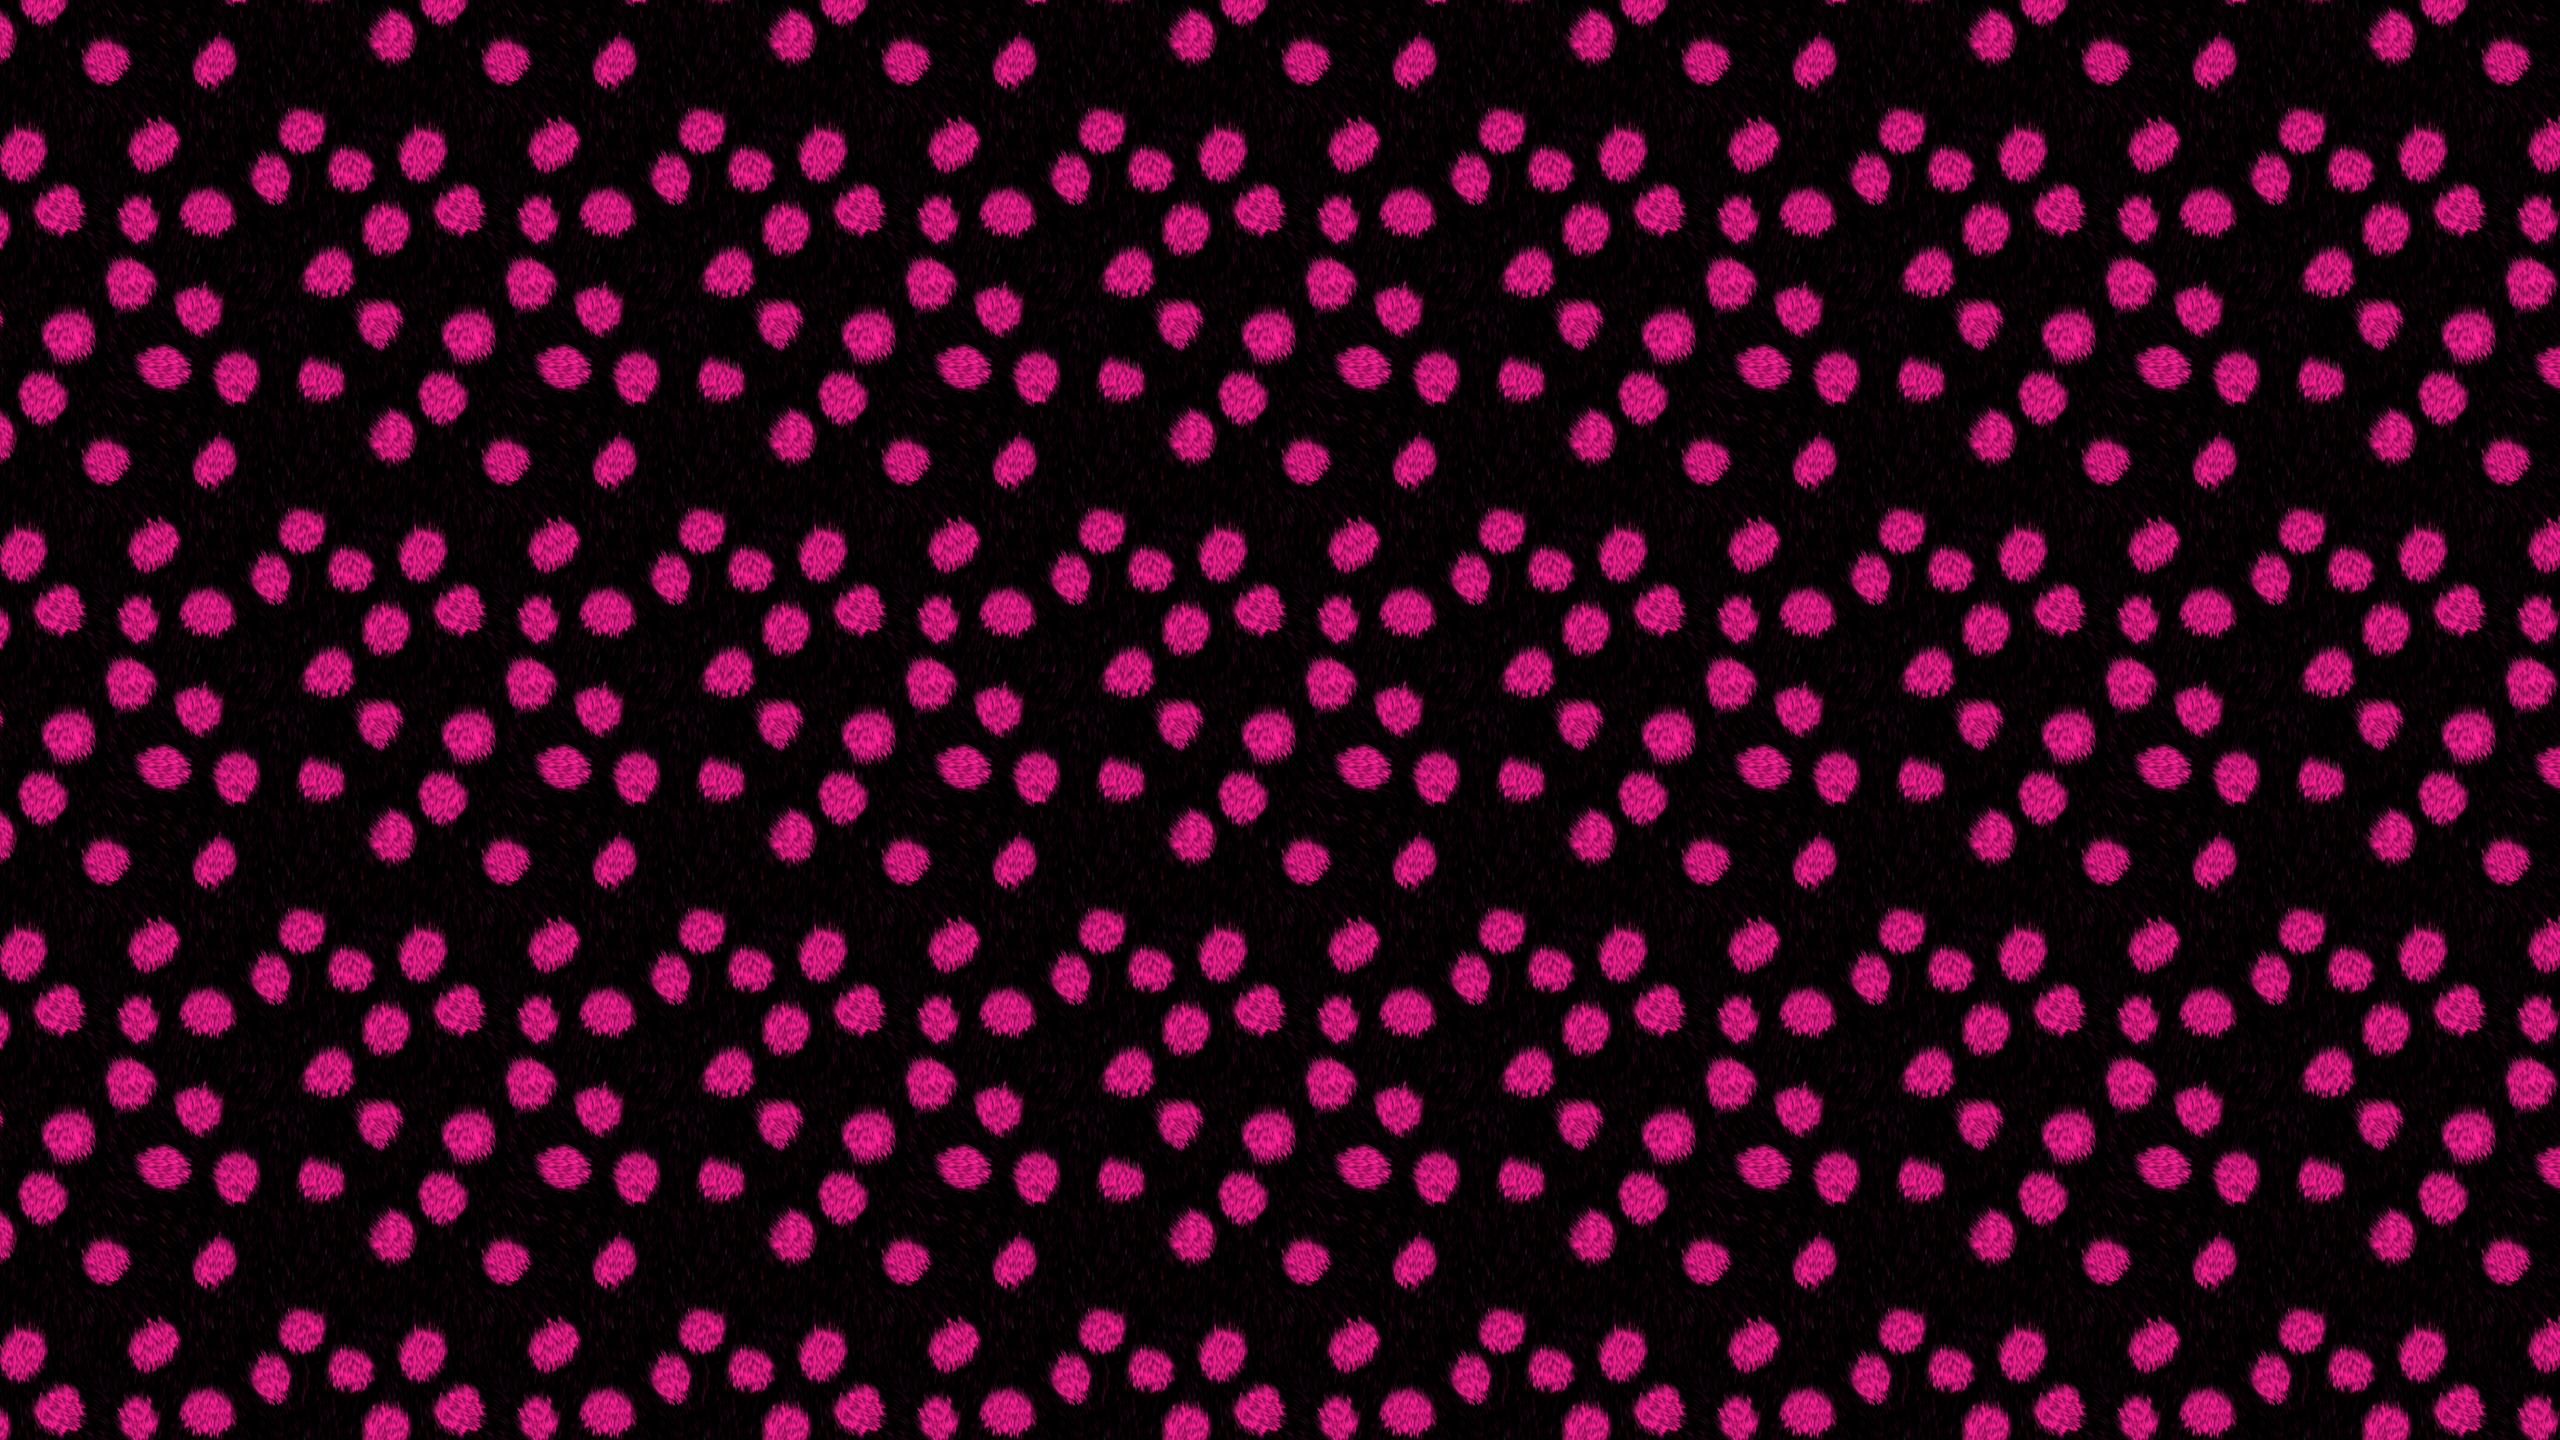 this Pink Polka Fur Desktop Wallpaper is easy Just save the wallpaper 2560x1440